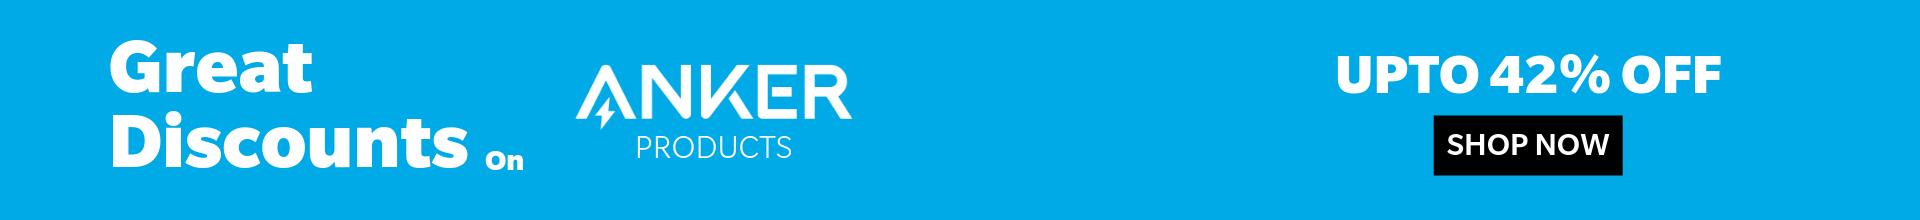 Anker Discount Web Banner 1920×220